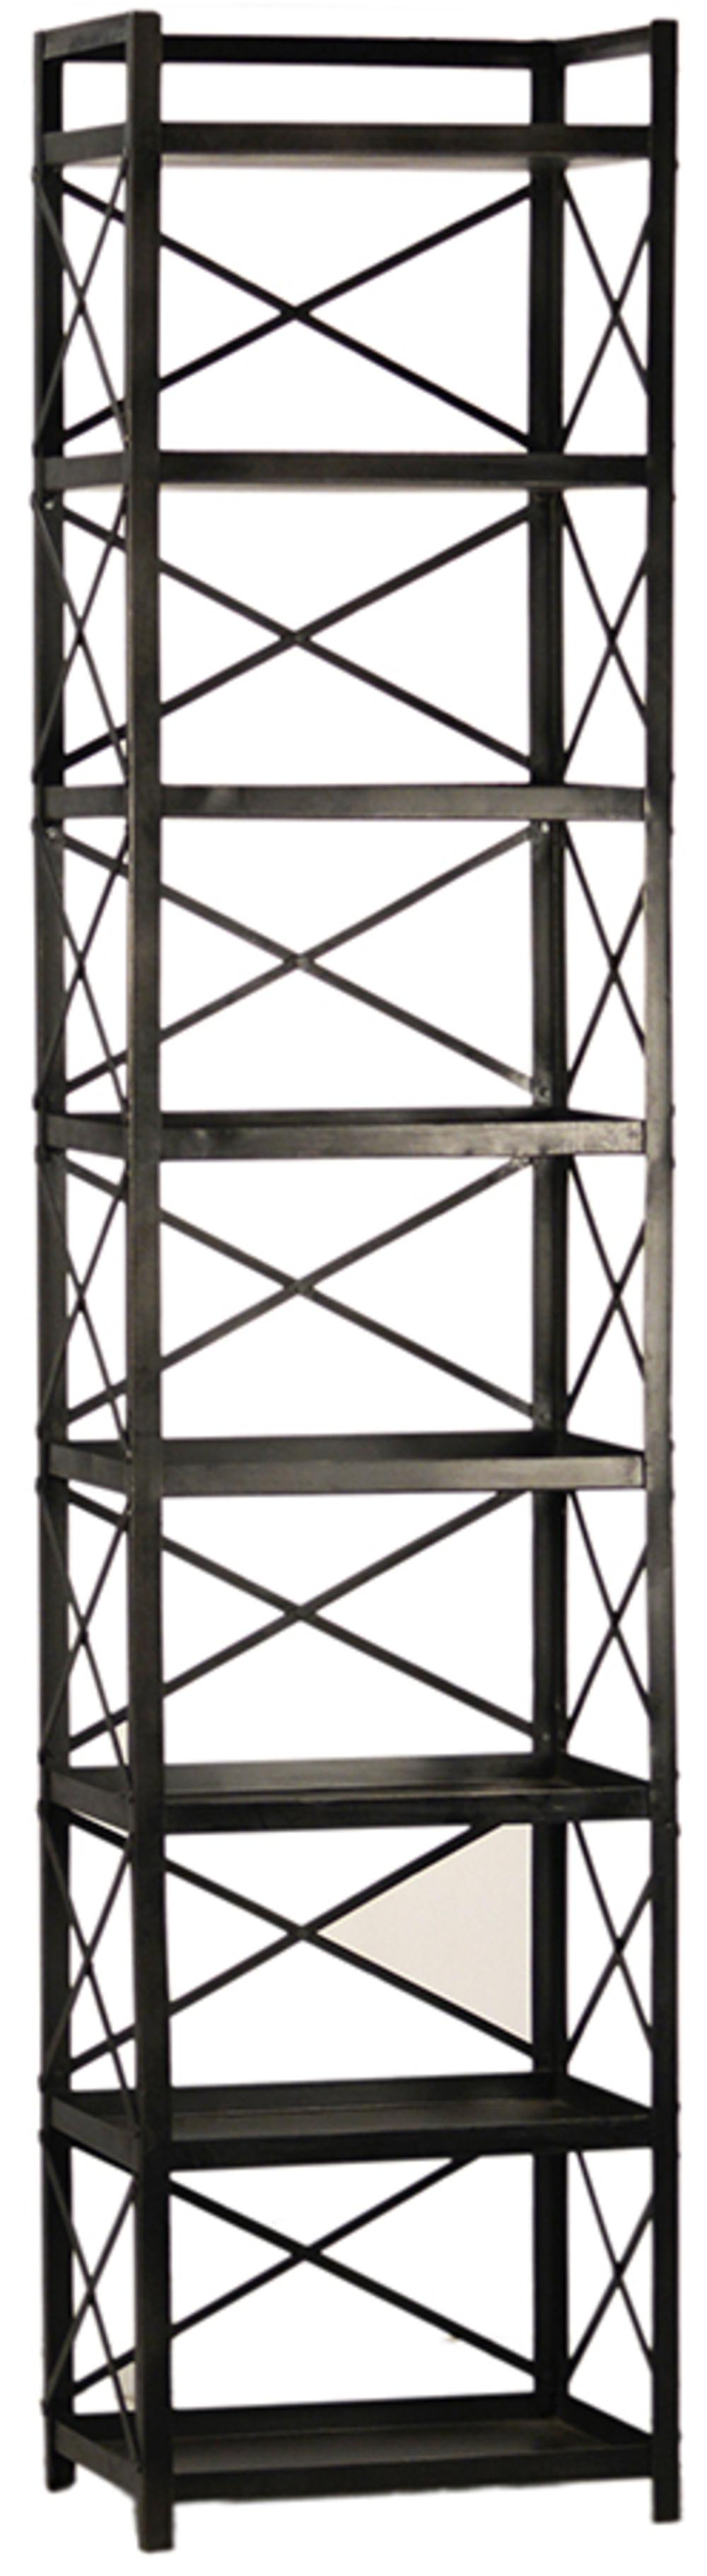 Dovetail Furniture - Oxford Bookcase